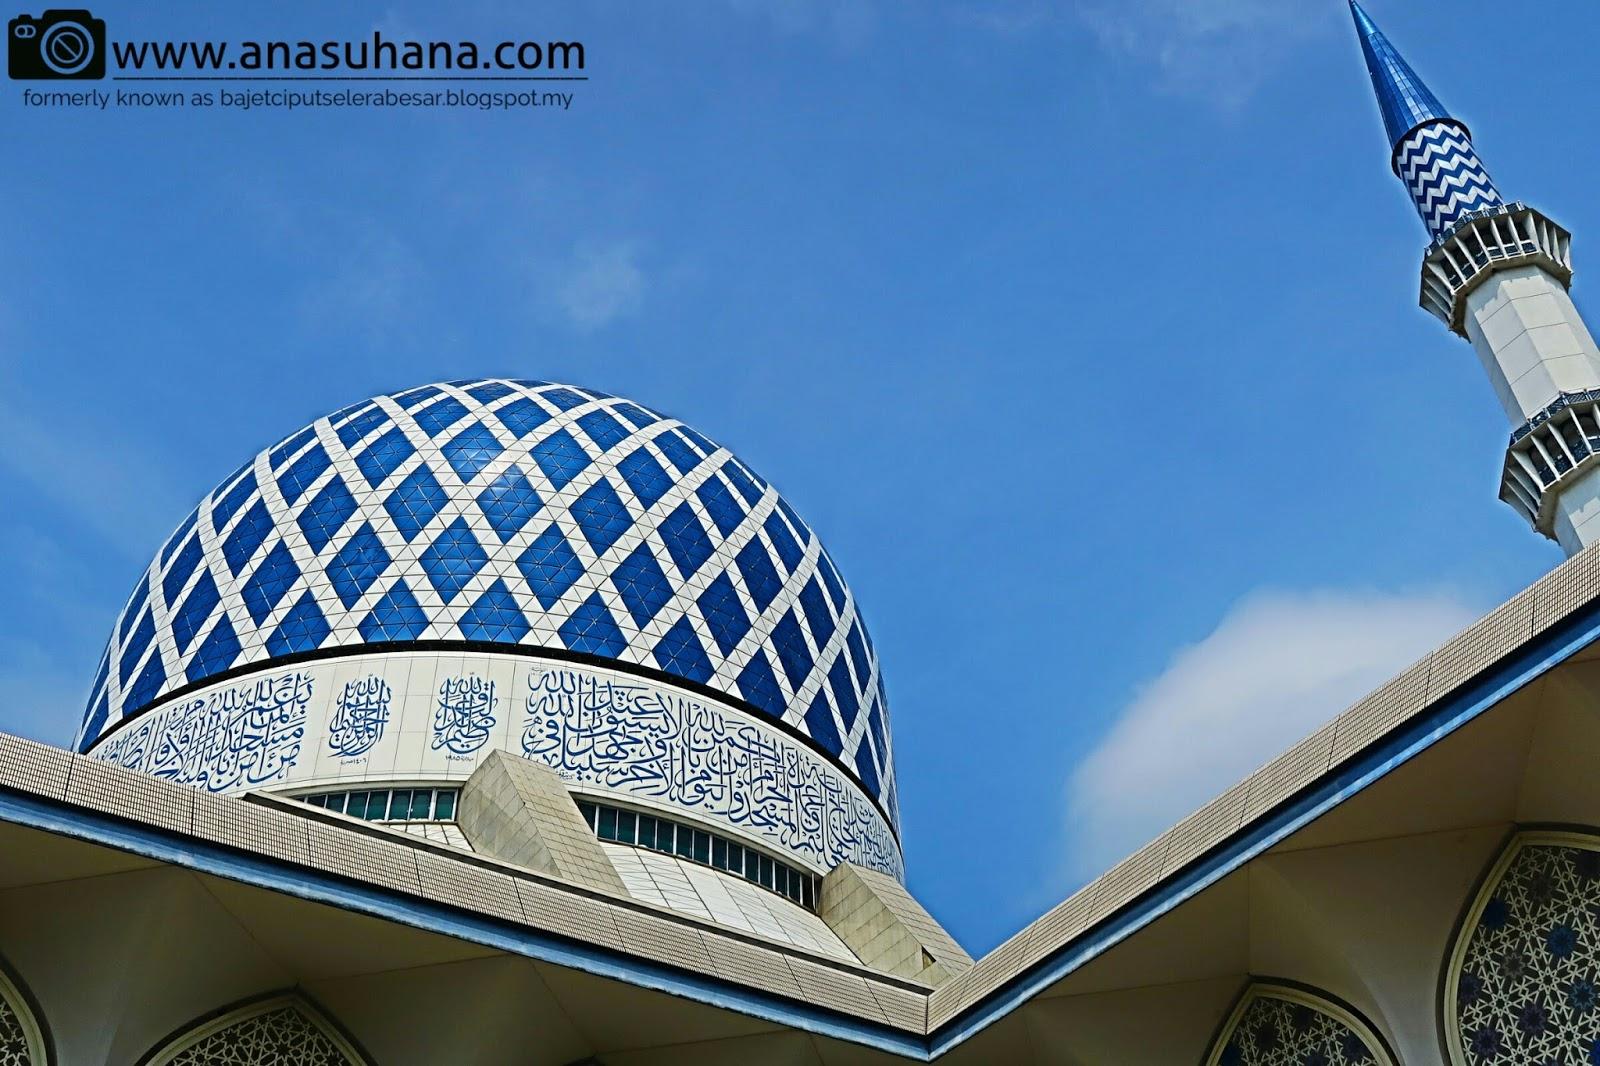 Tempat Menarik di Shah Alam : Masjid Sultan Salahudin Abdul Aziz Shah